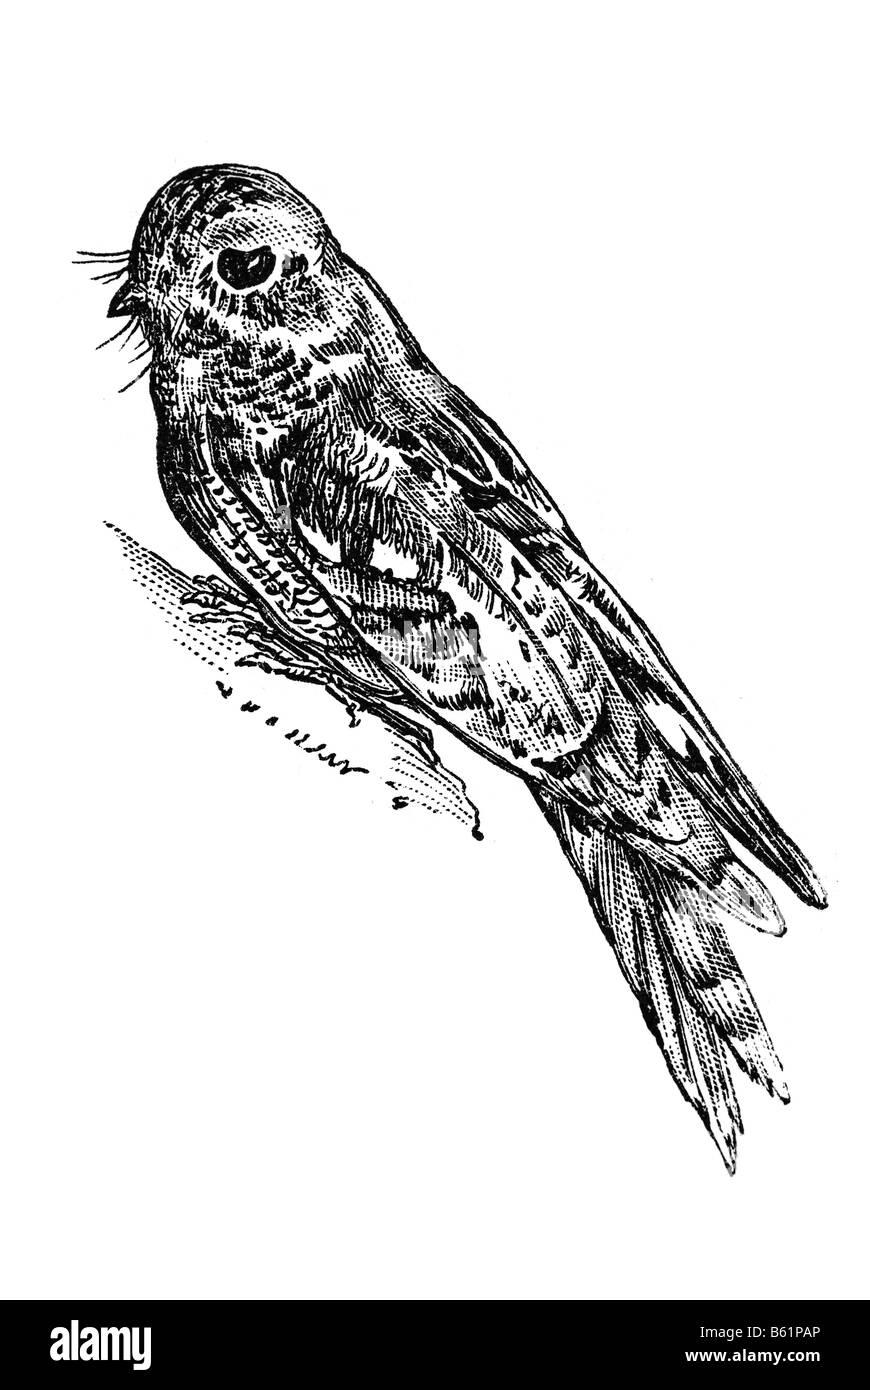 European Nightjar, or just Nightjar (Caprimulgus europaeus) Stock Photo